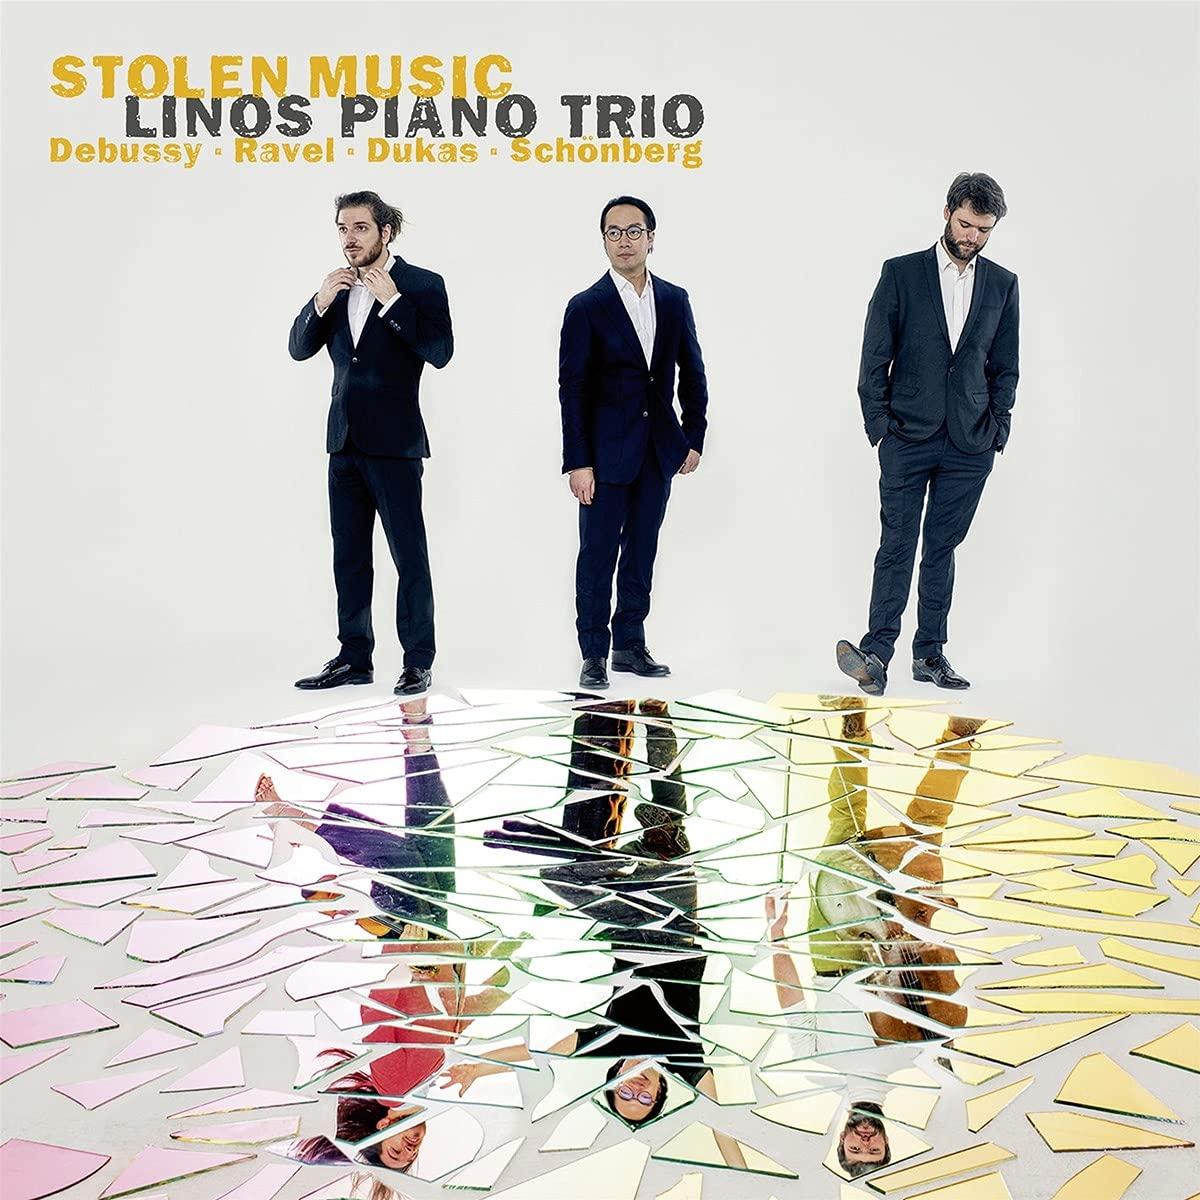 Stolen Music, Transcriptions For Piano Trio - Linos Piano Trio